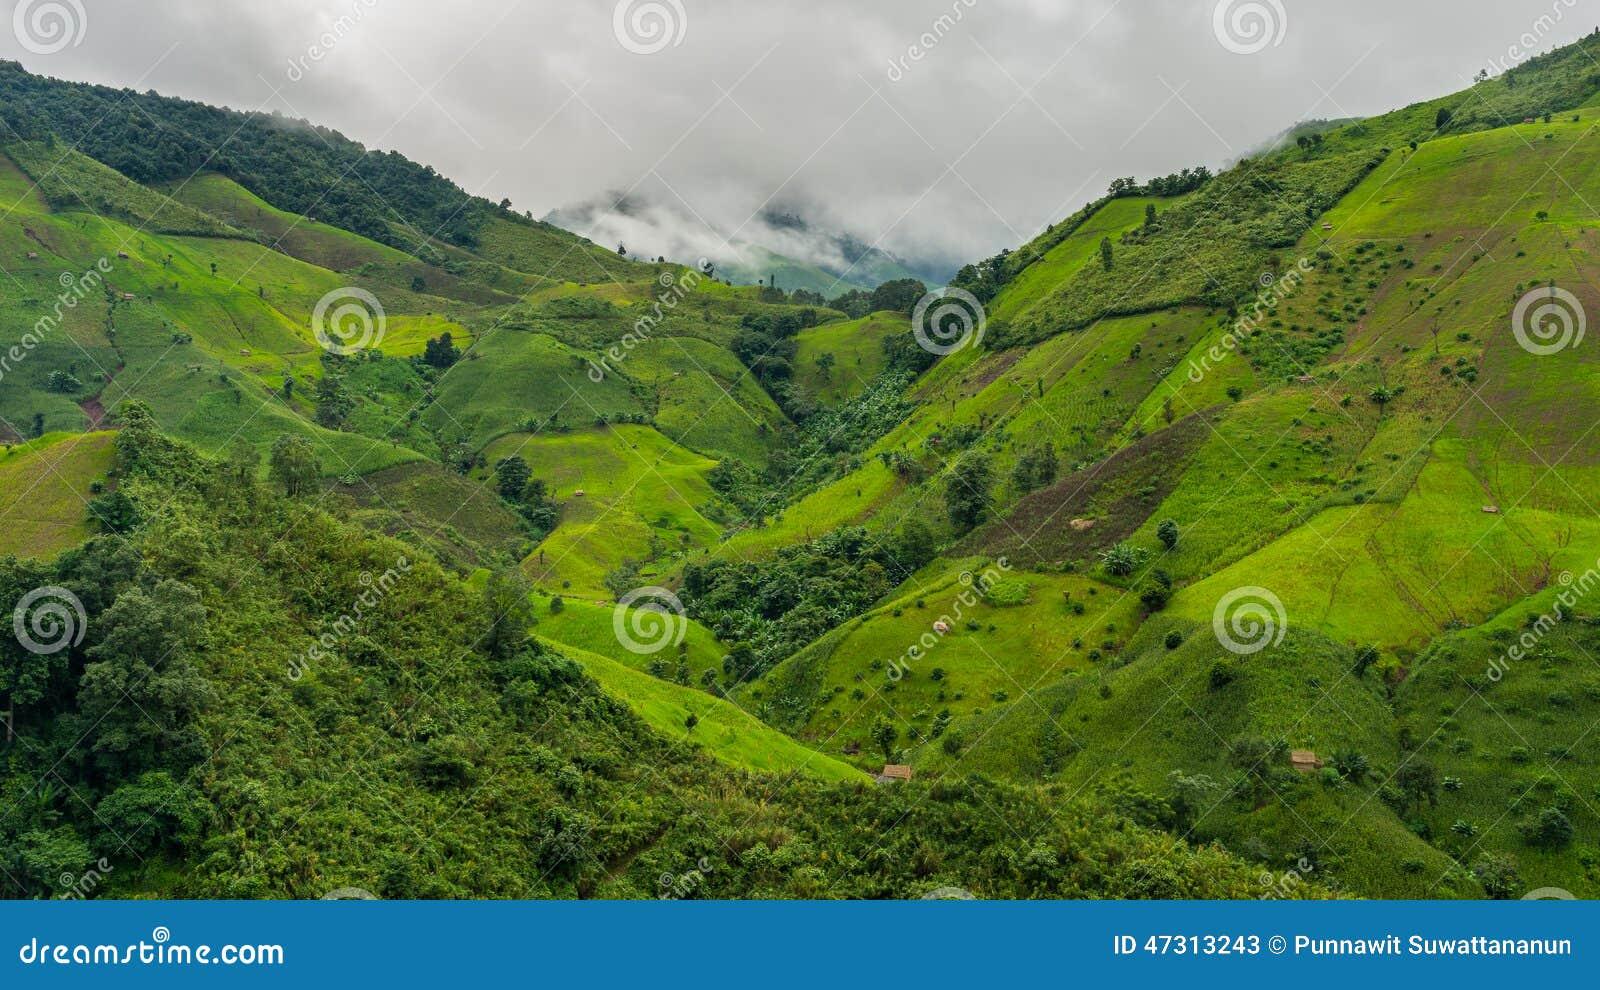 beautiful mountain landscapes   hot girls wallpaper